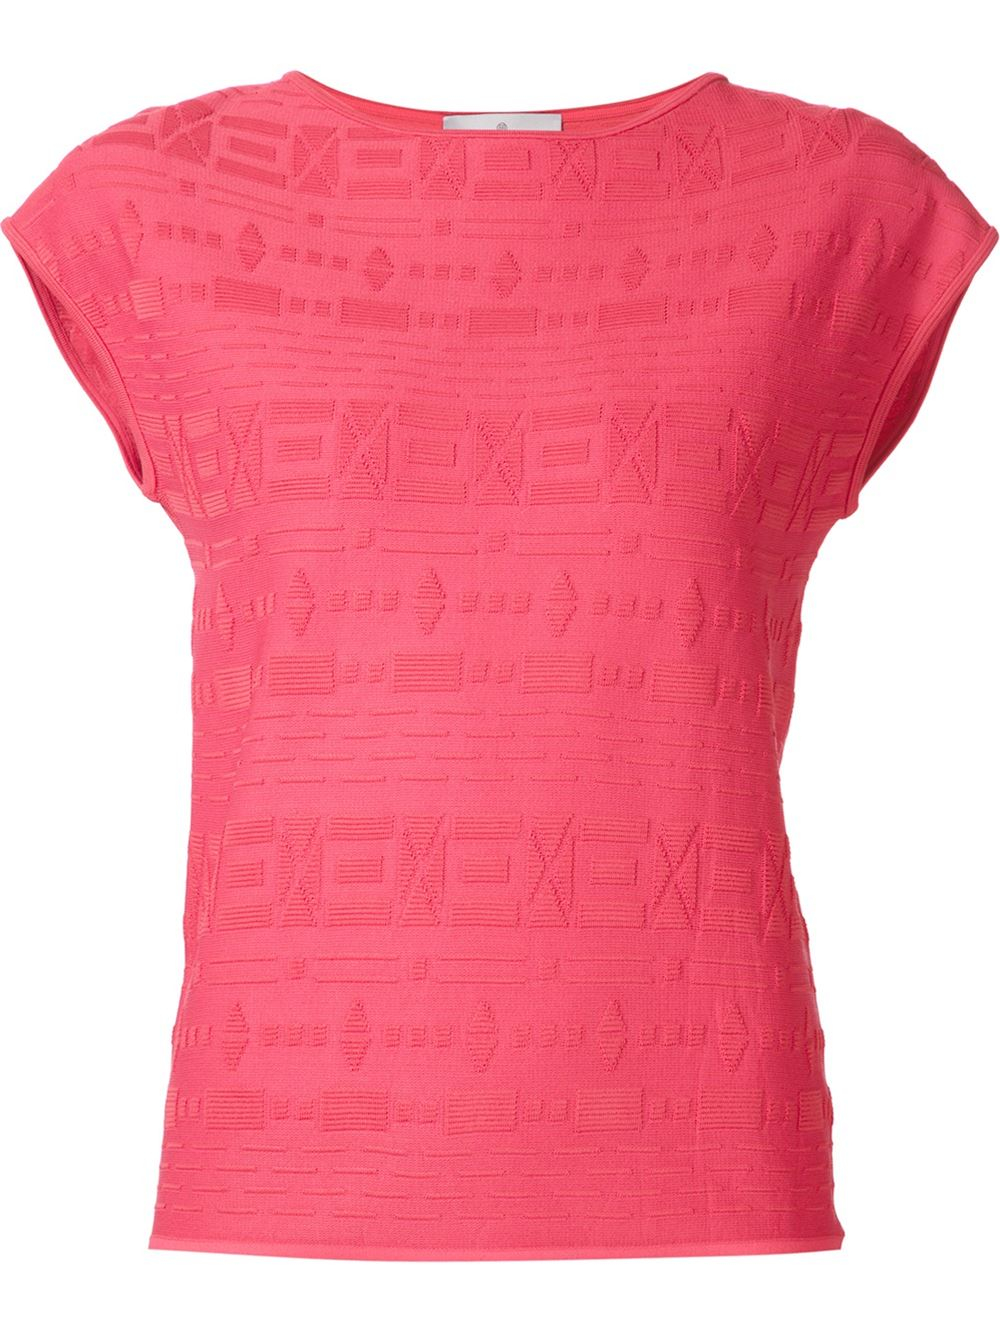 Knitted Shirt Pattern : Maison ullens Geometric Pattern Knitted T-shirt Lyst